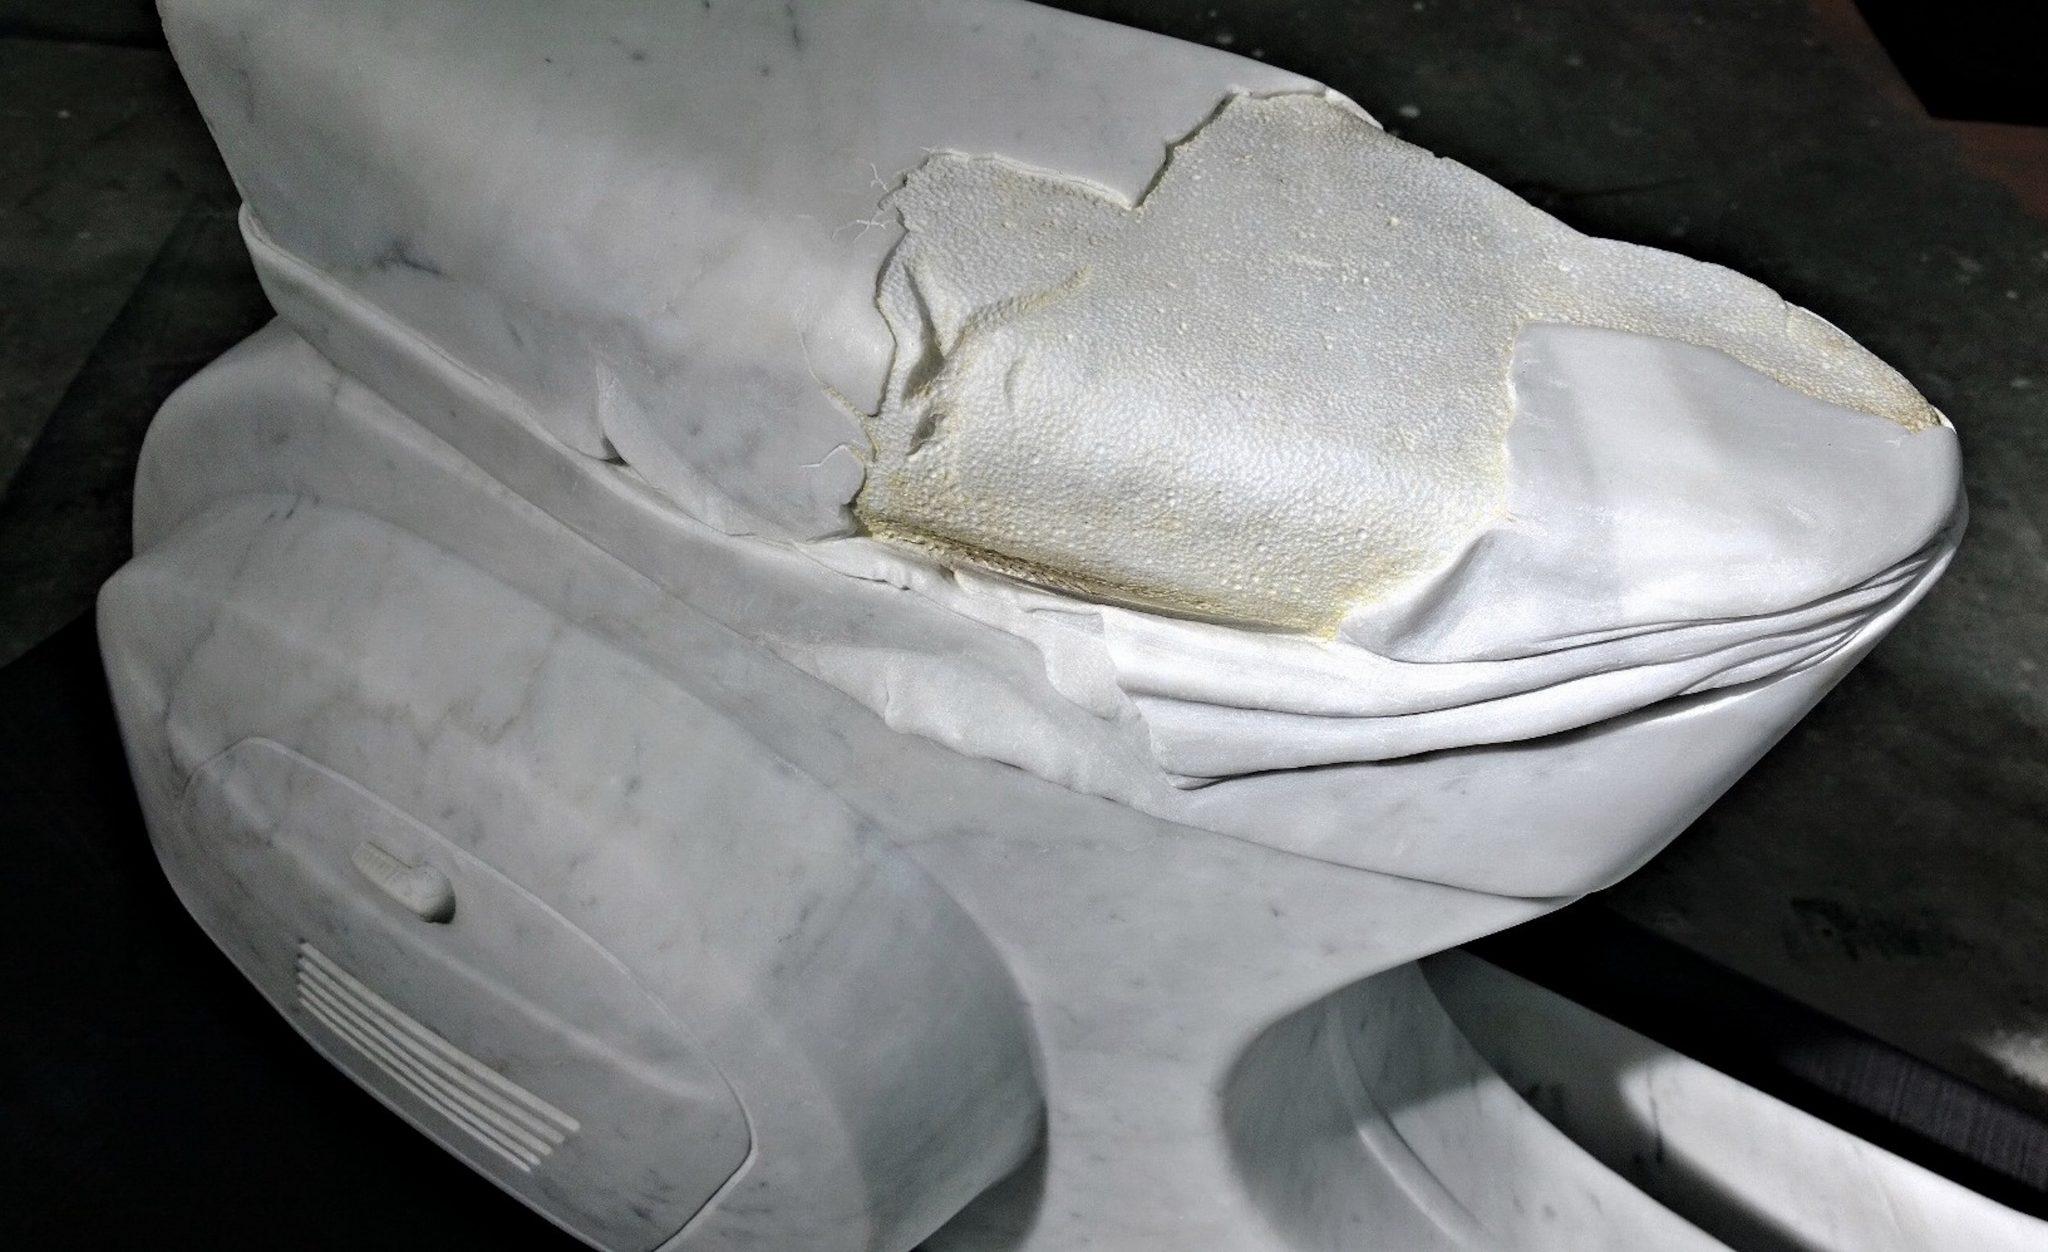 Nazareno Biondo Midsummer Night's Dream marmo bianco Carrara 160x70x50cm 2011 collab.Daniele Miola…. ..